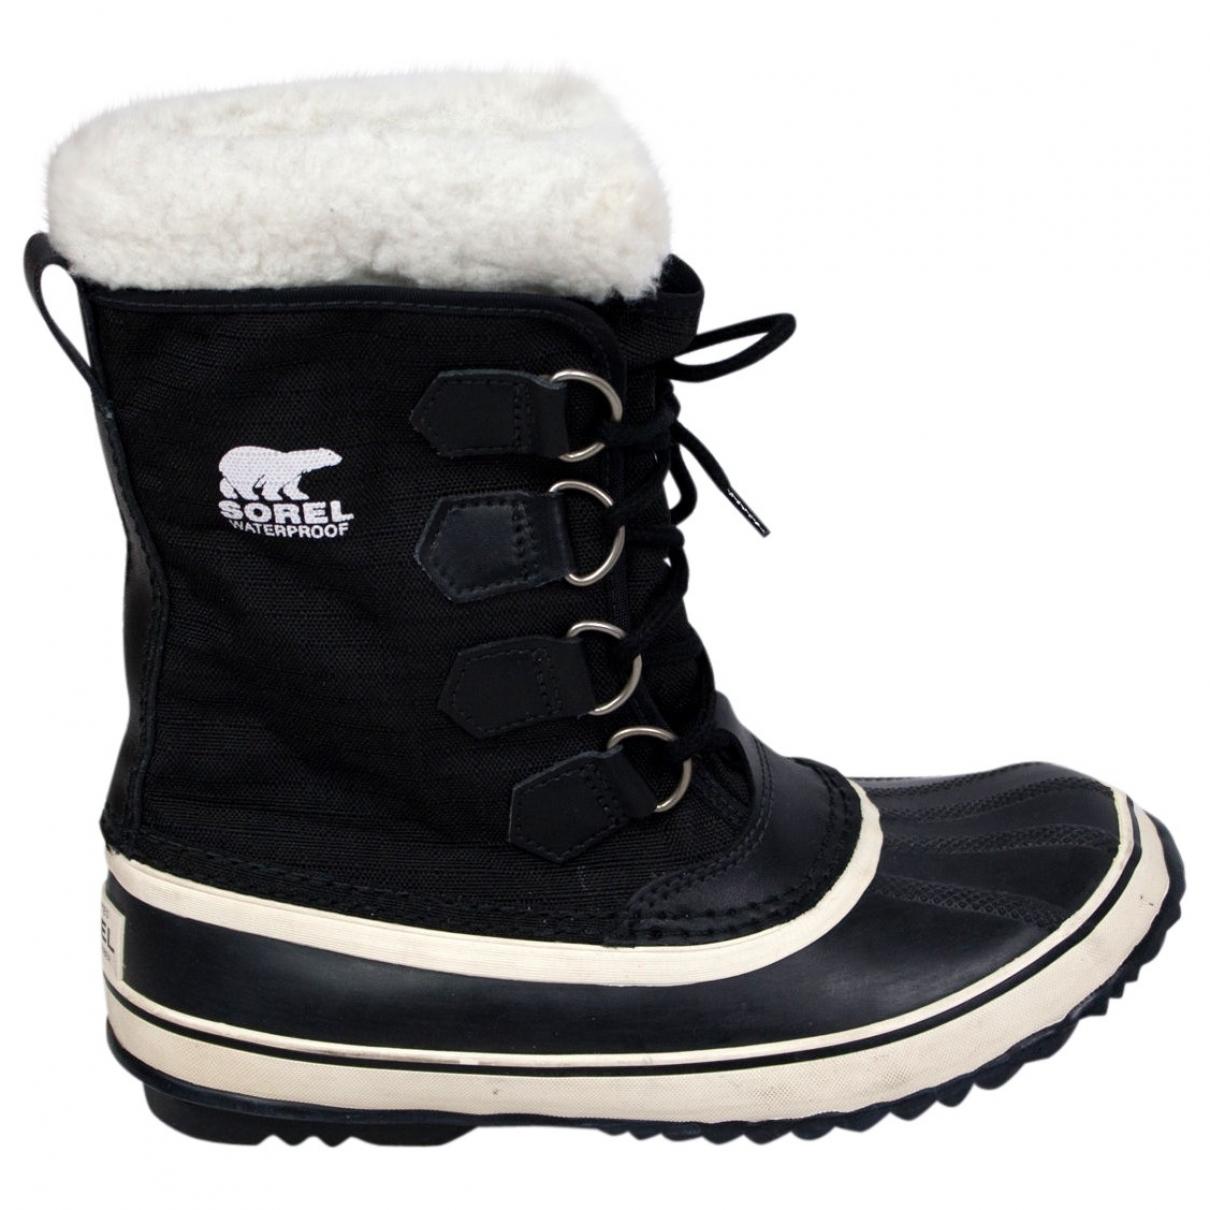 Sorel \N Black Rubber Boots for Women 7 US